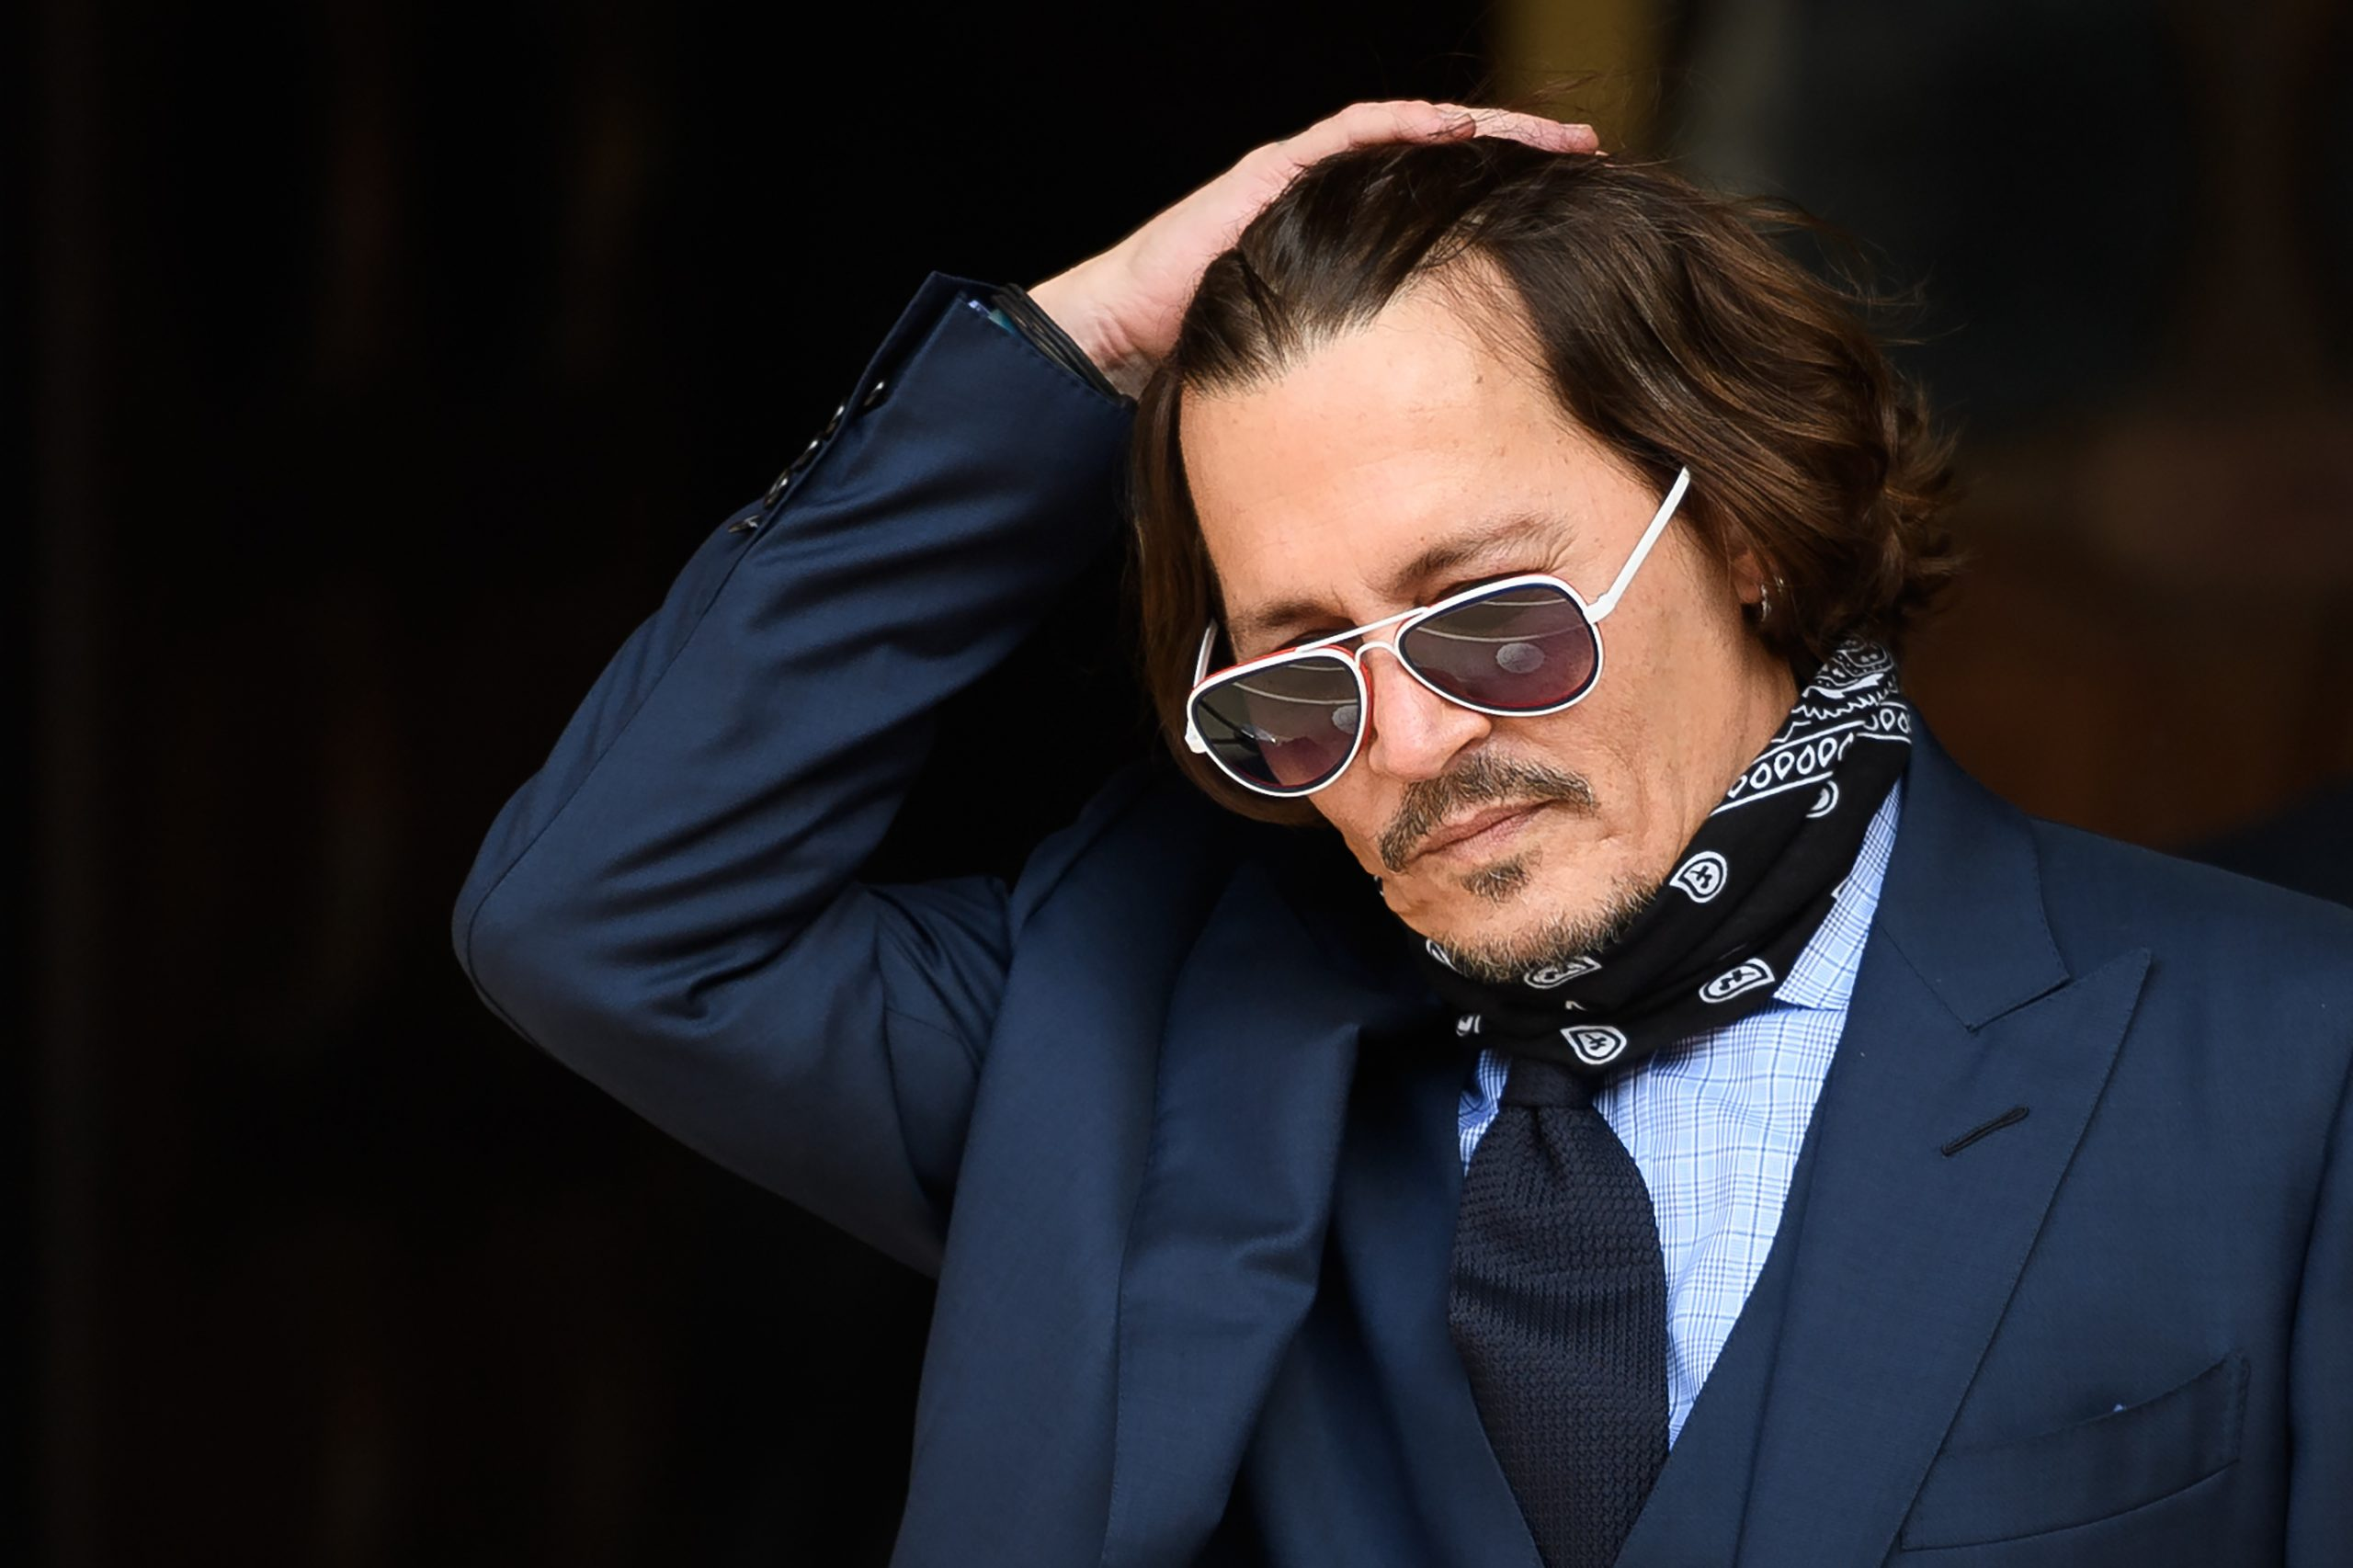 Zeuge: Amber Heard täuschte Verletzung durch Ex-Ehemann Johnny Depp vor